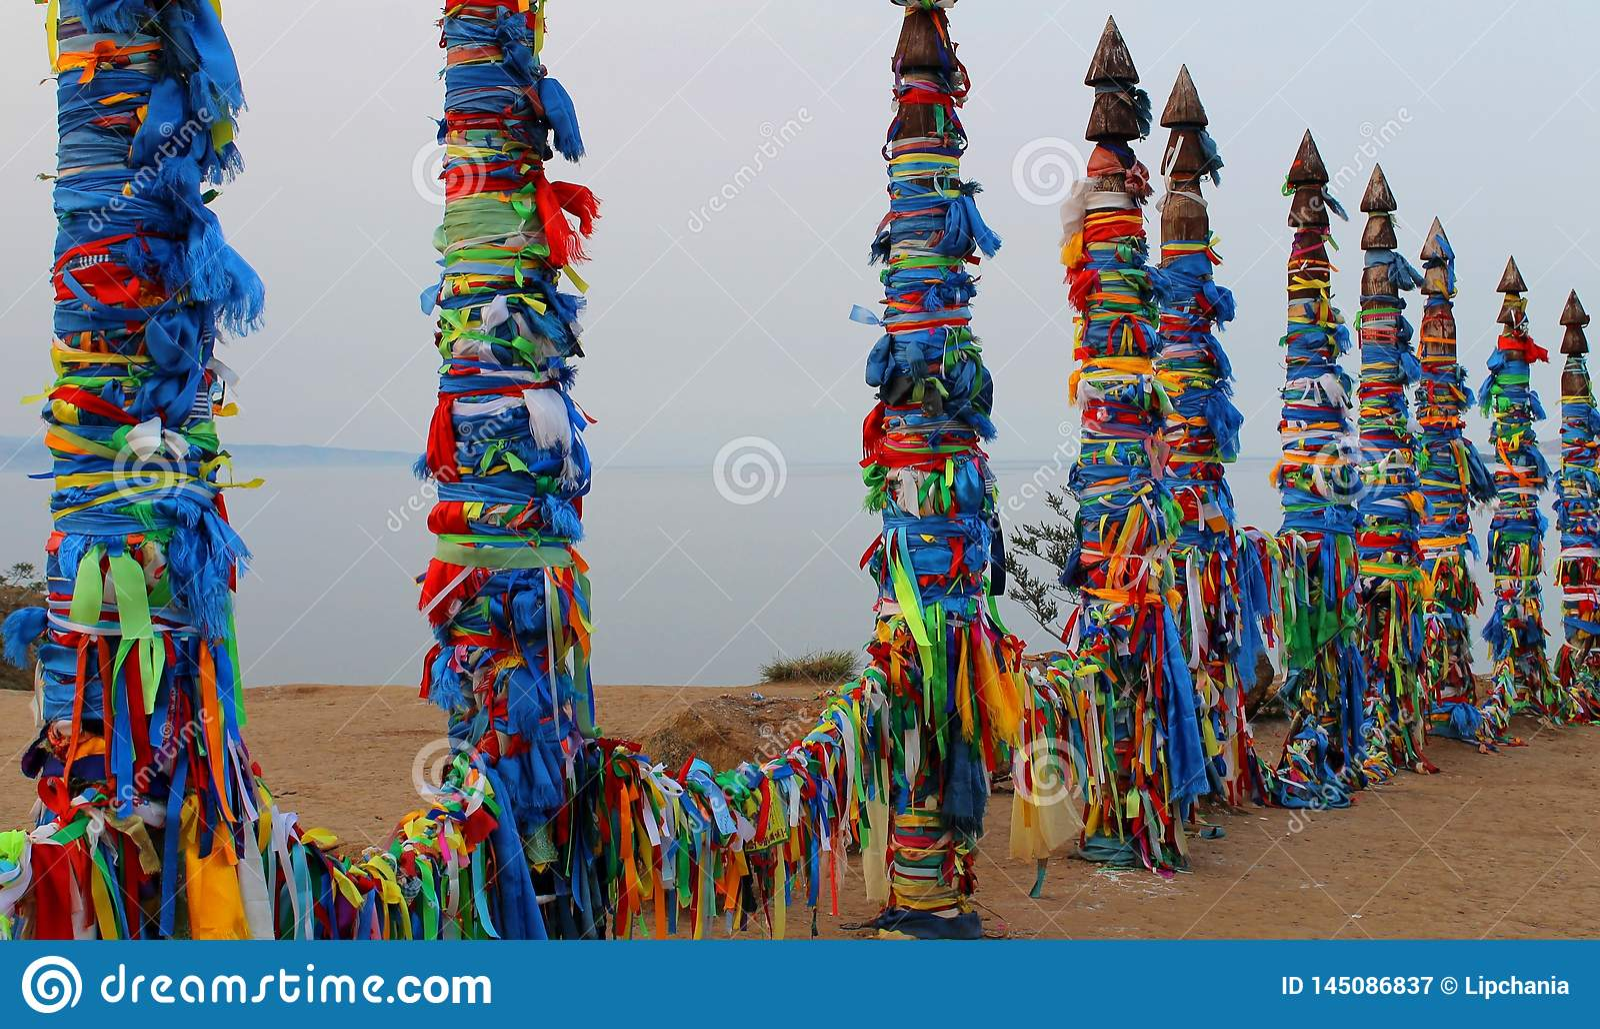 Religiöse helle bunte asiatische Säulen